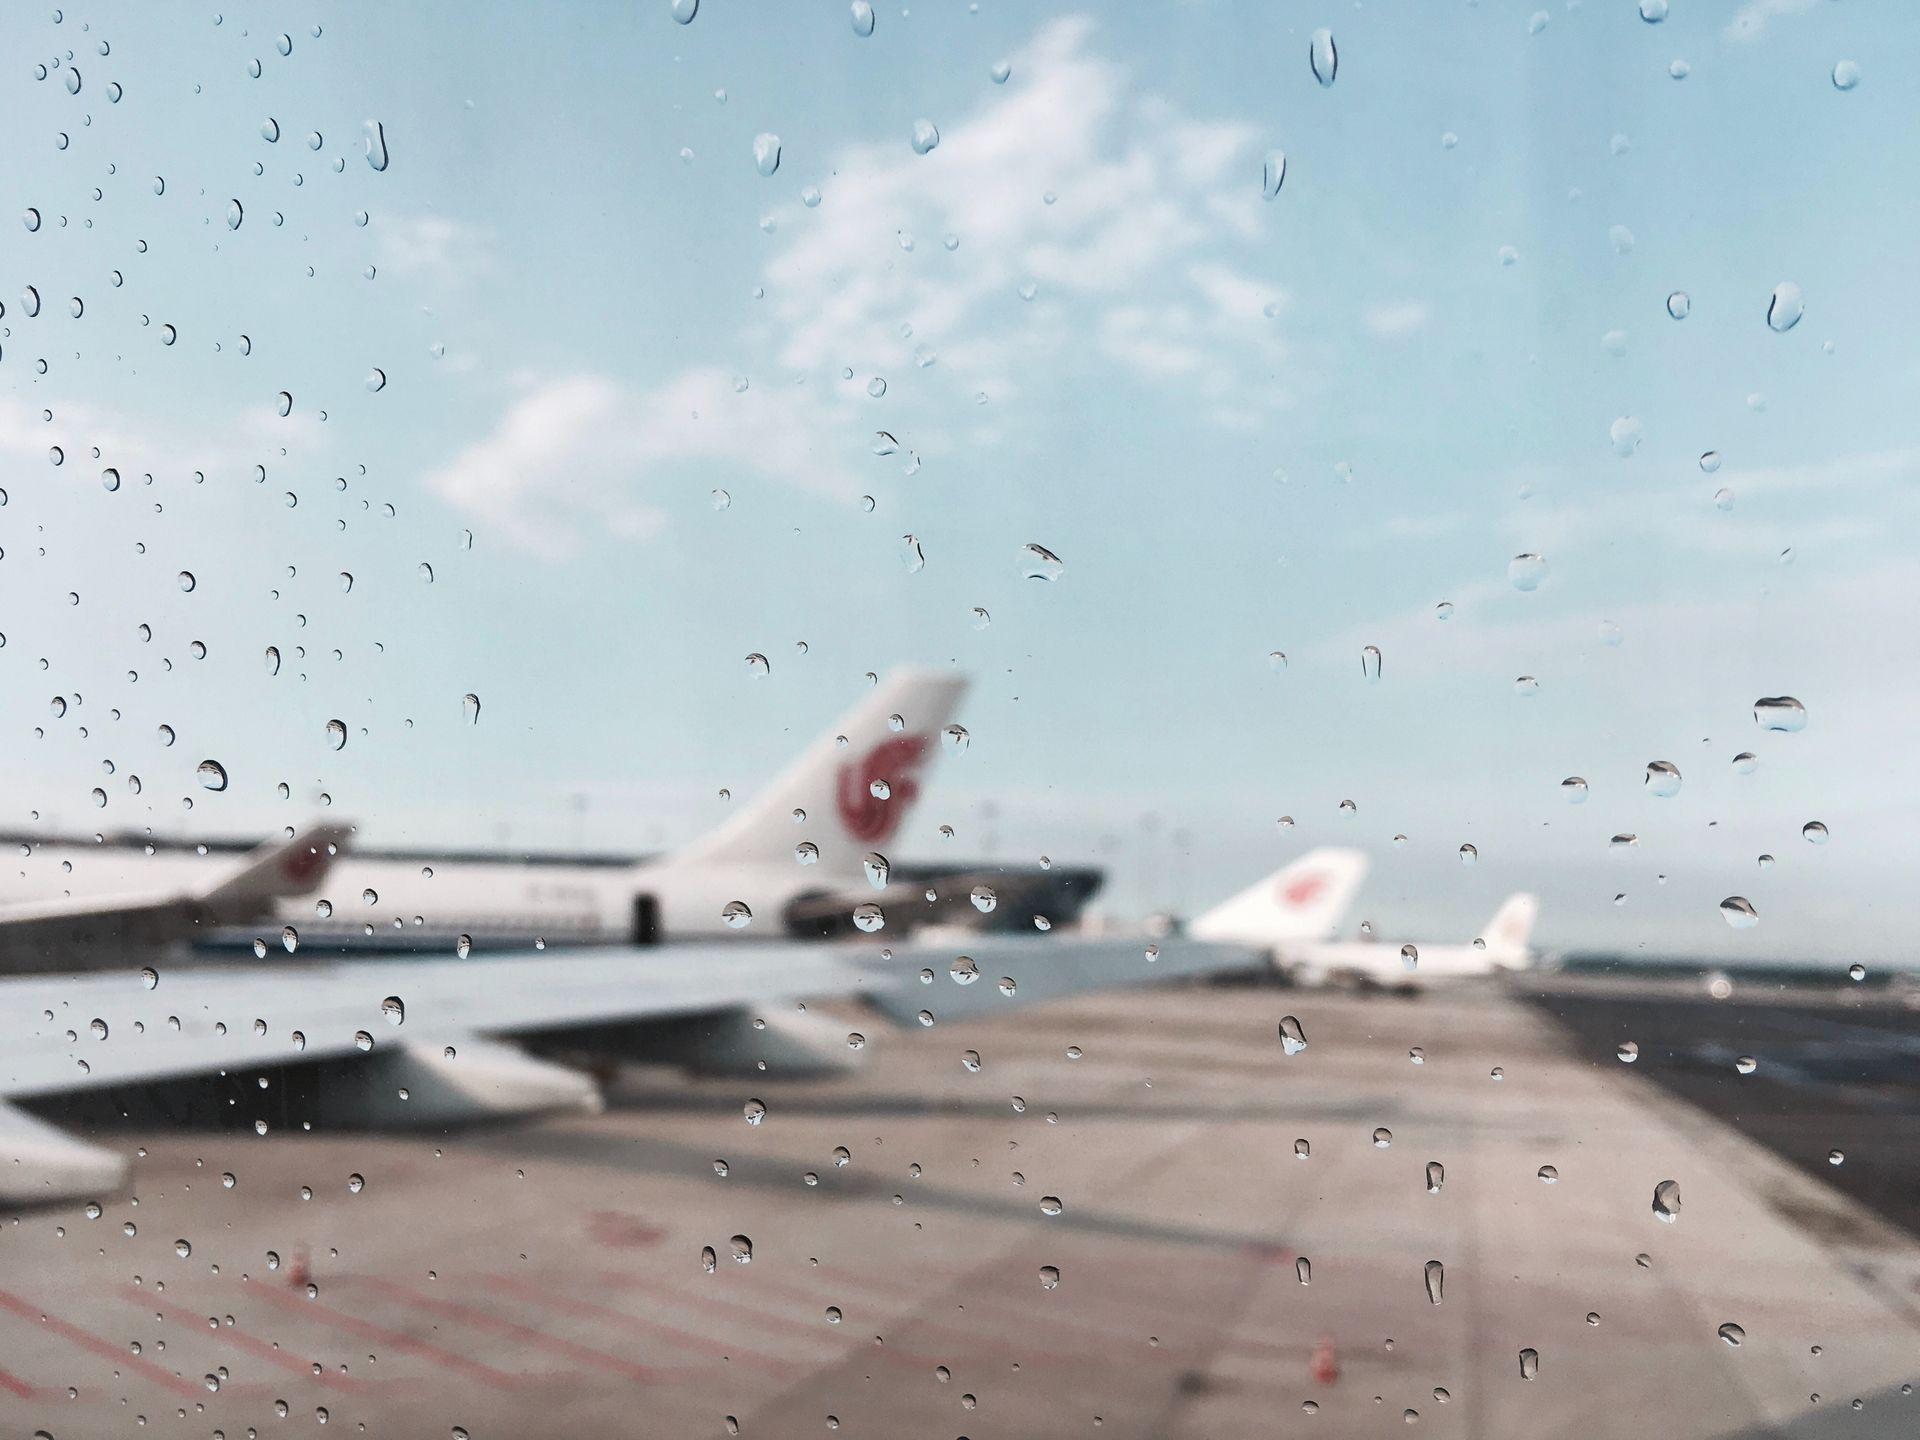 Google Flights povidomljatyme pro zatrymku rejsiv